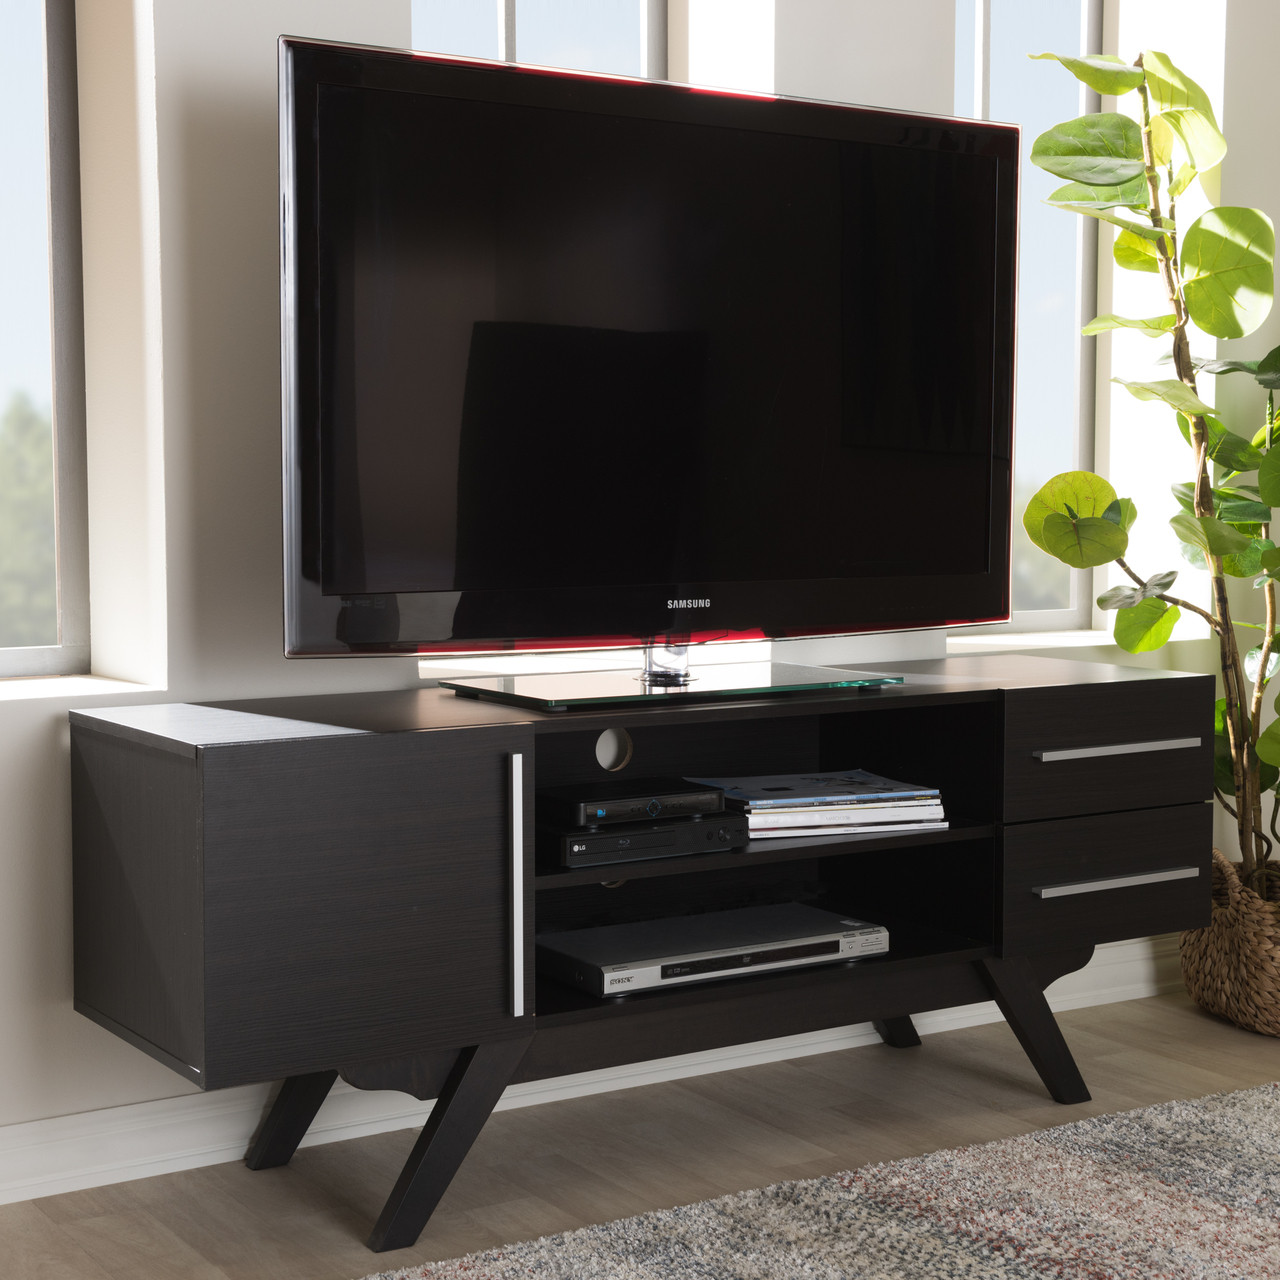 ed649904767 Baxton Studio Ashfield Mid-Century Modern Dark Brown Finished Wood TV Stand  - DealBeds.com